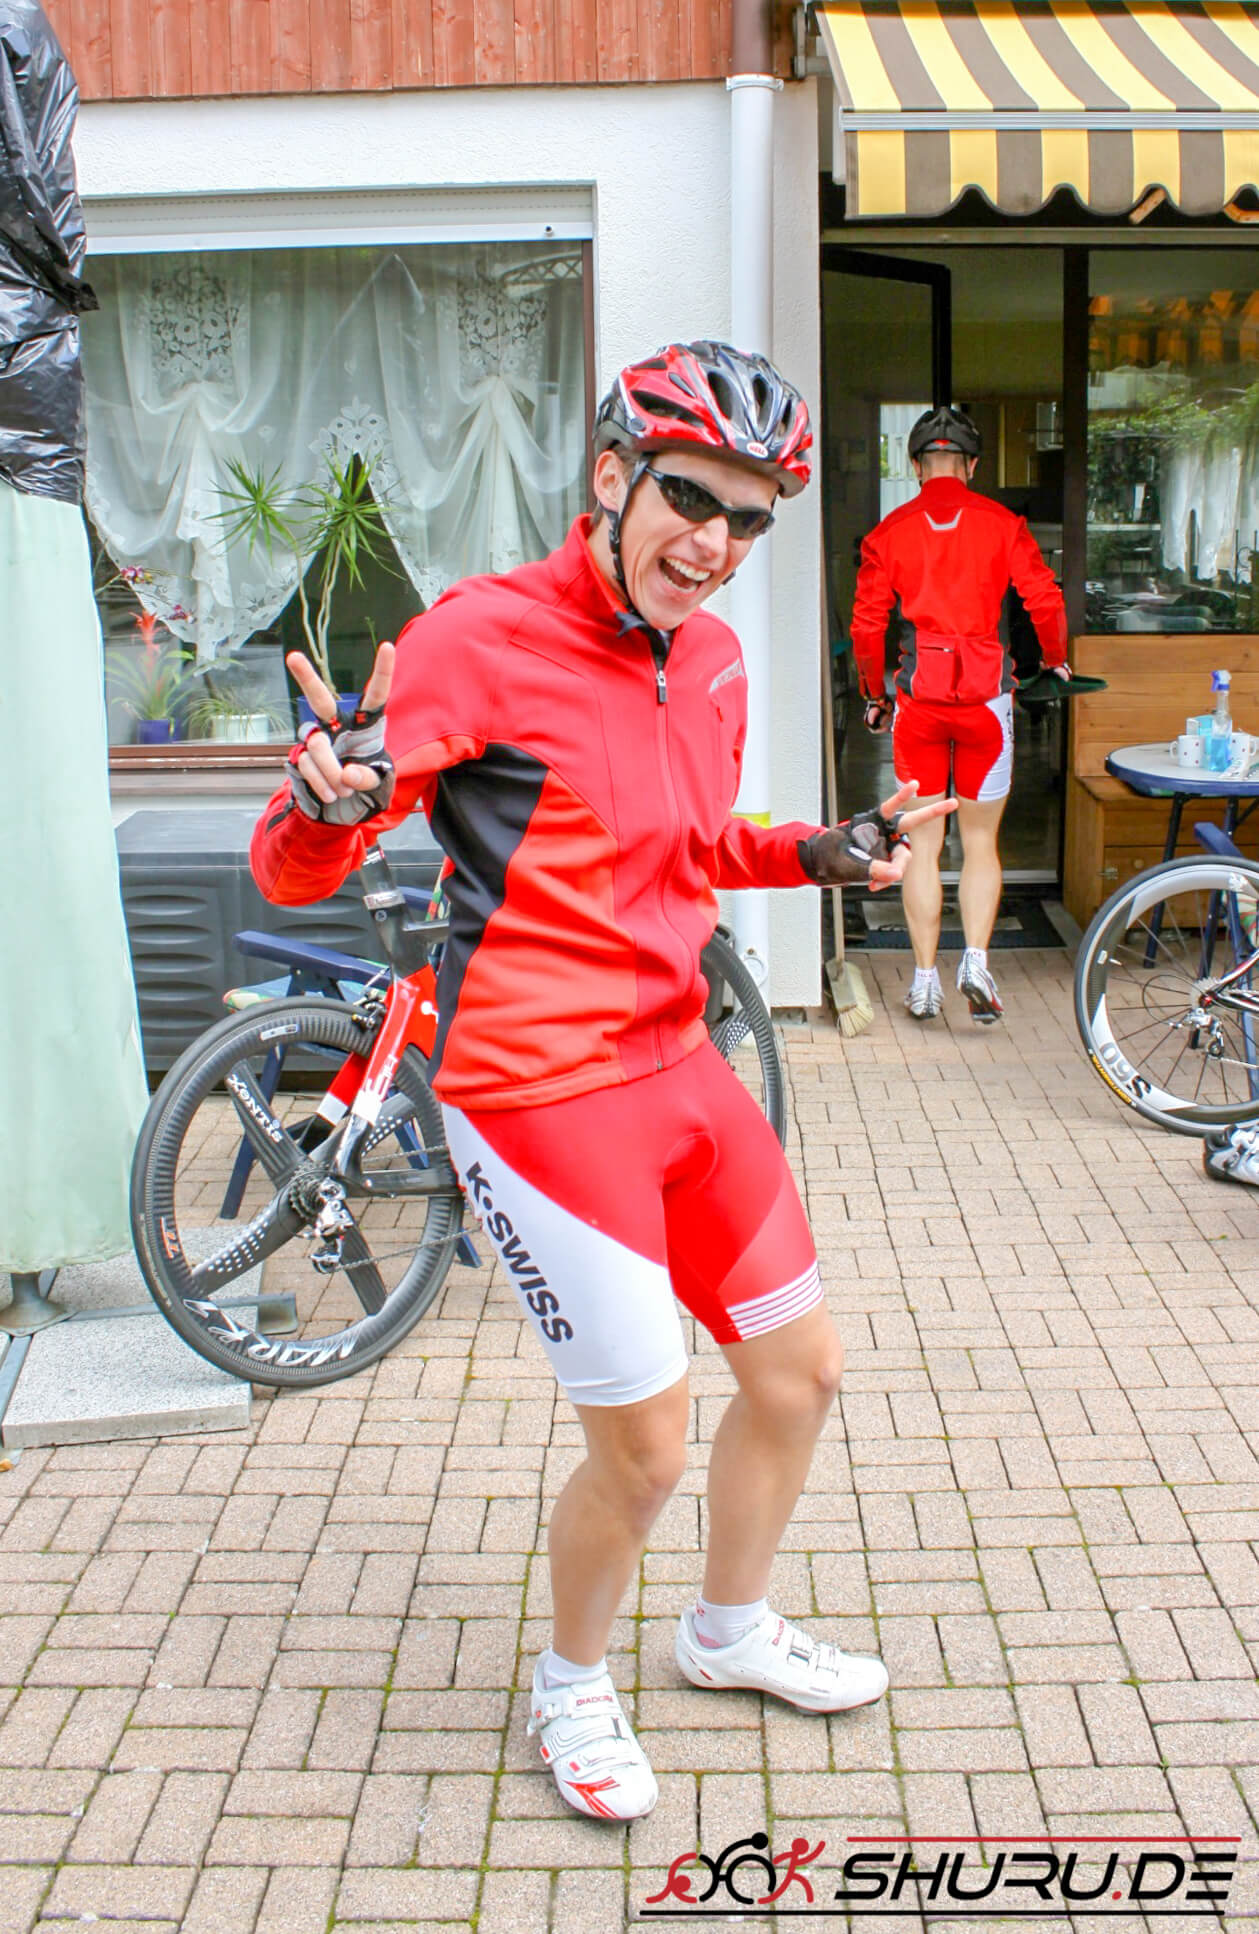 Fahrradbekleidung für den Frühling